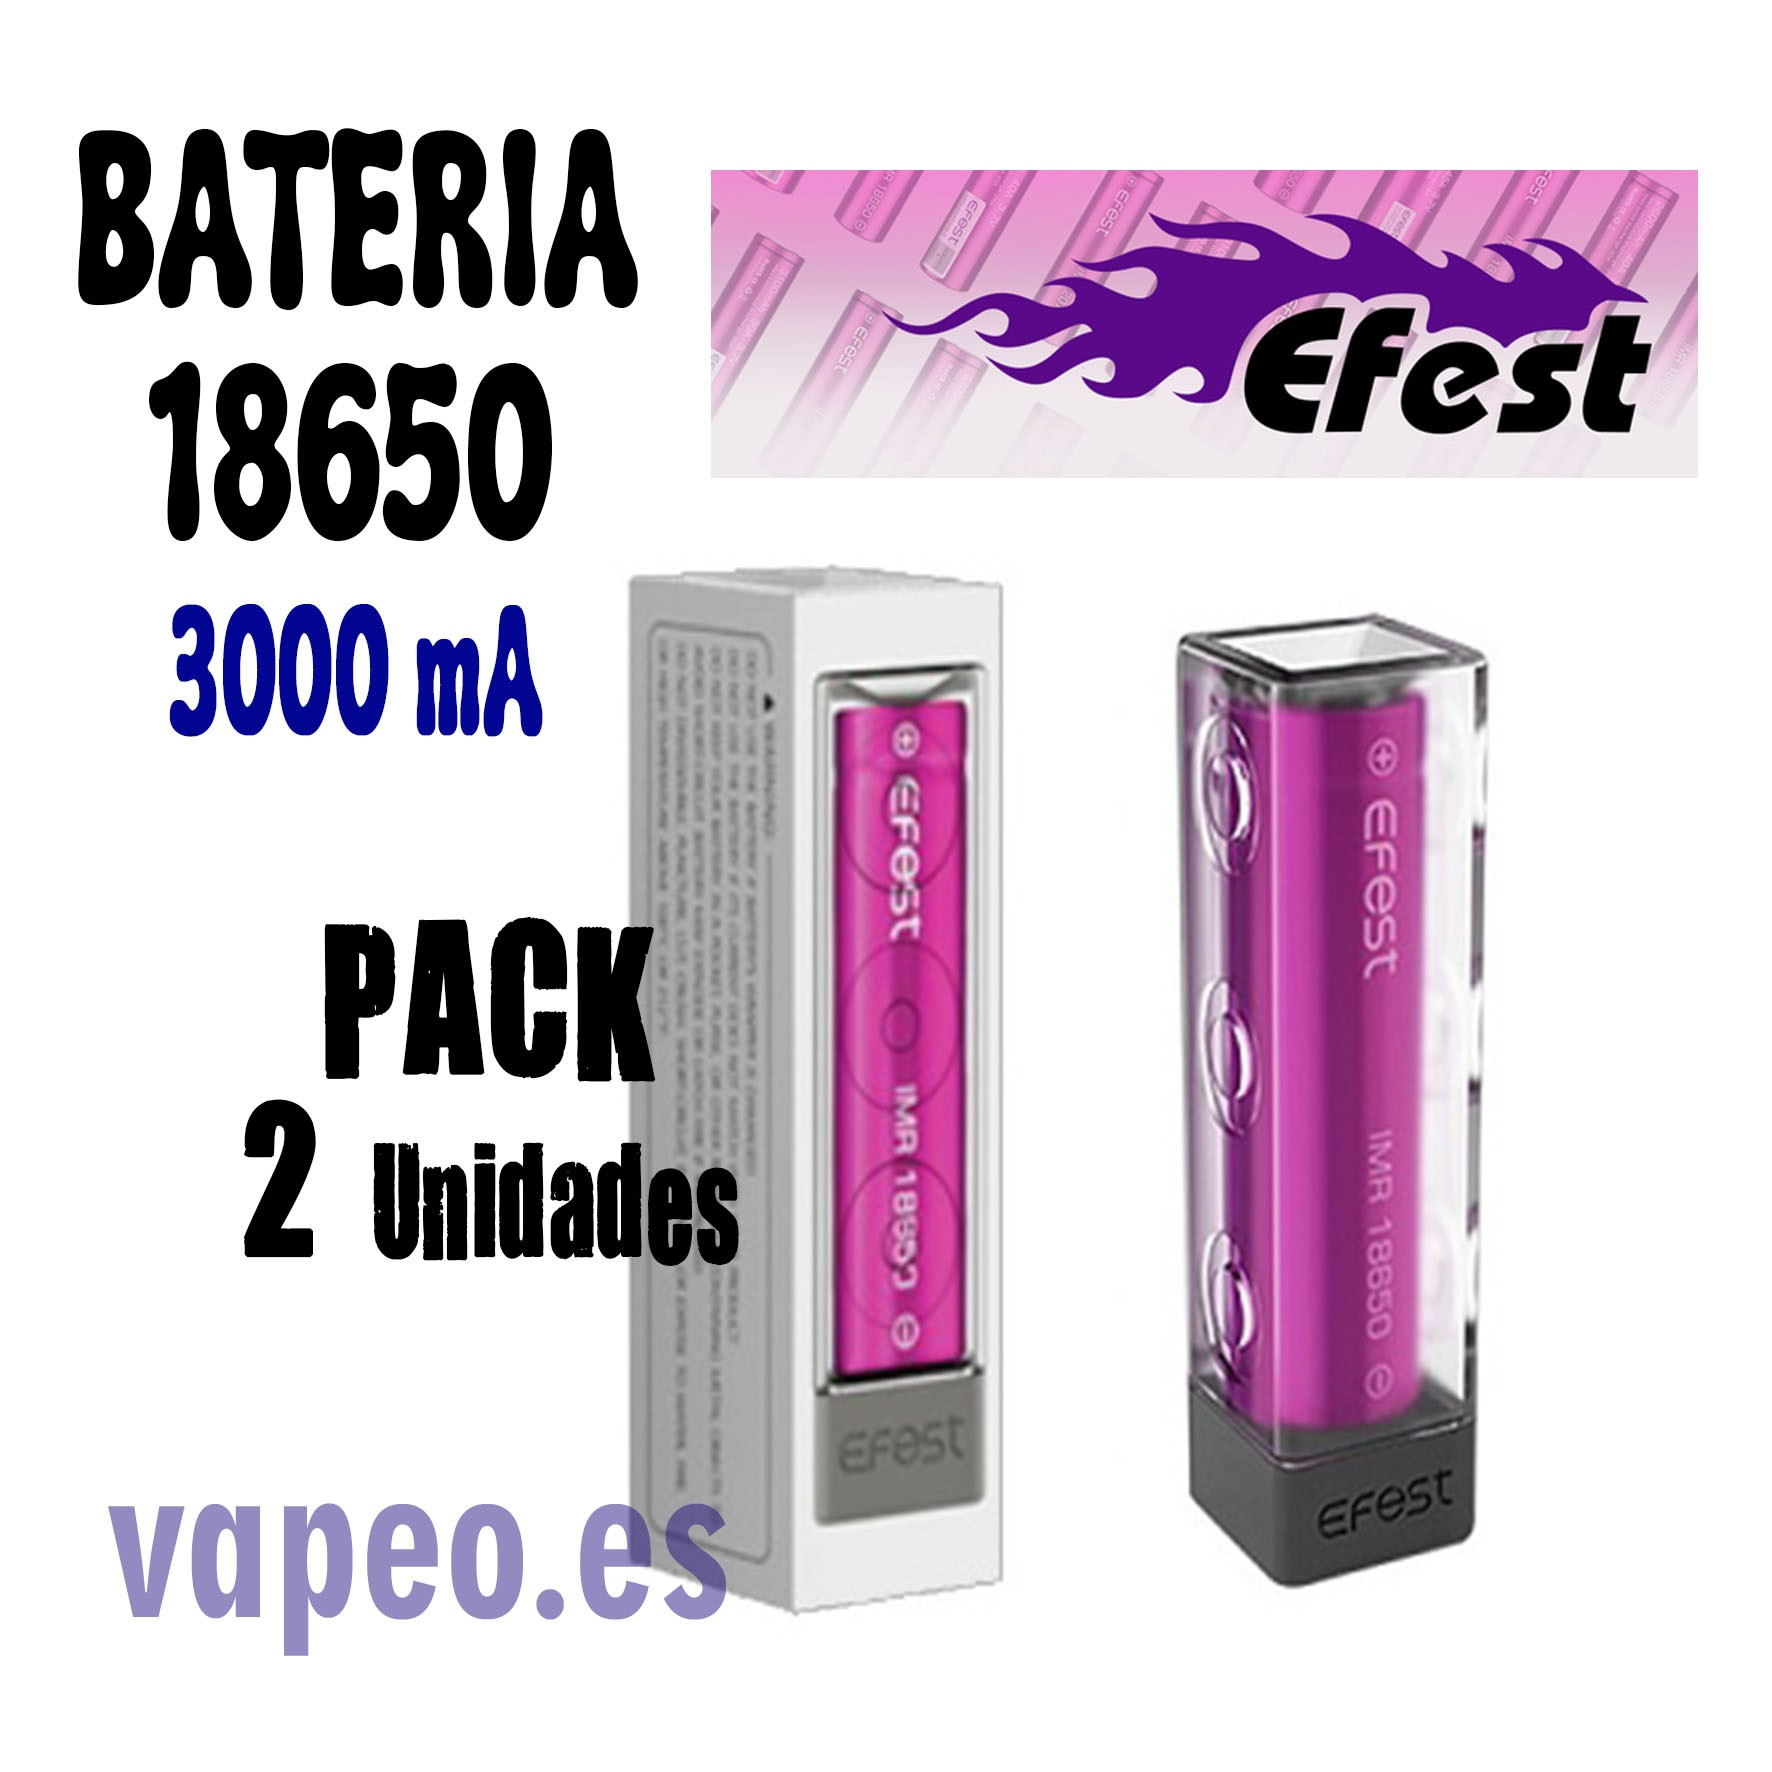 EFEST 18650 3000 ma pack